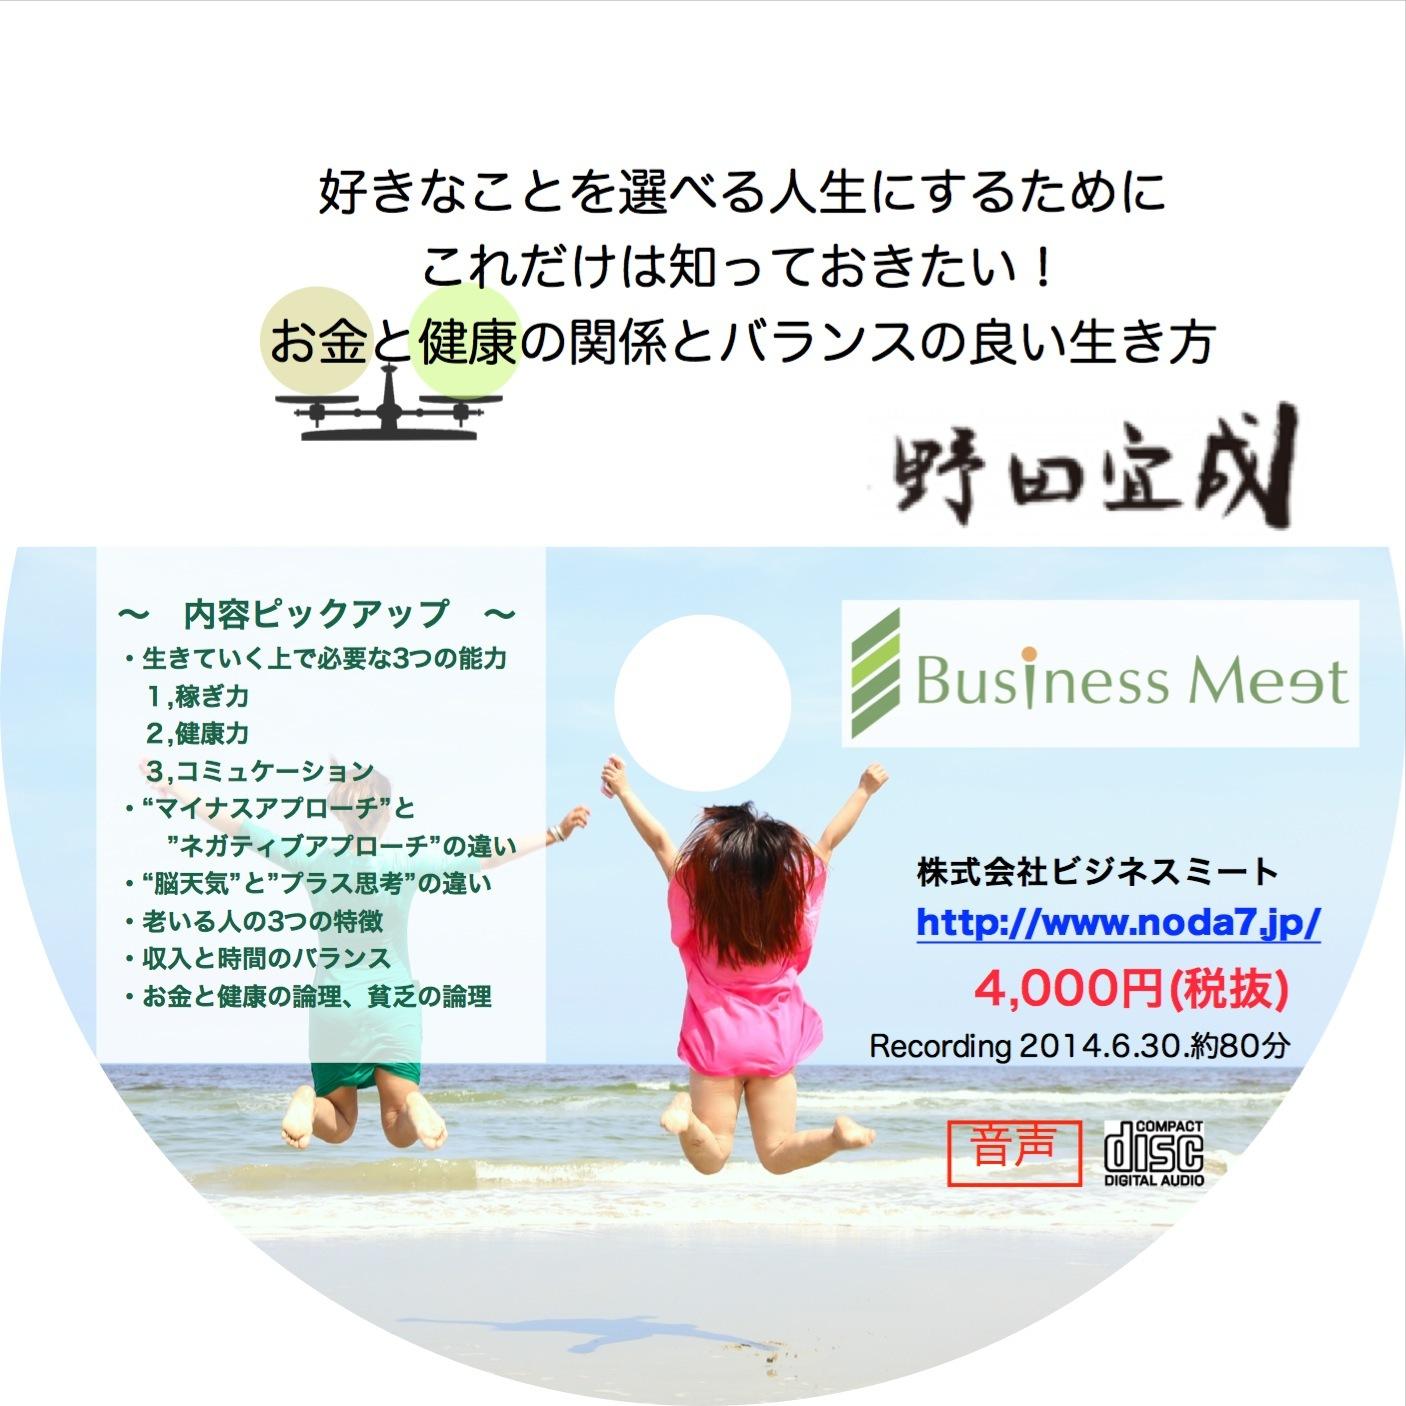 [CD]お金と健康、バランスの良い生き方 CD